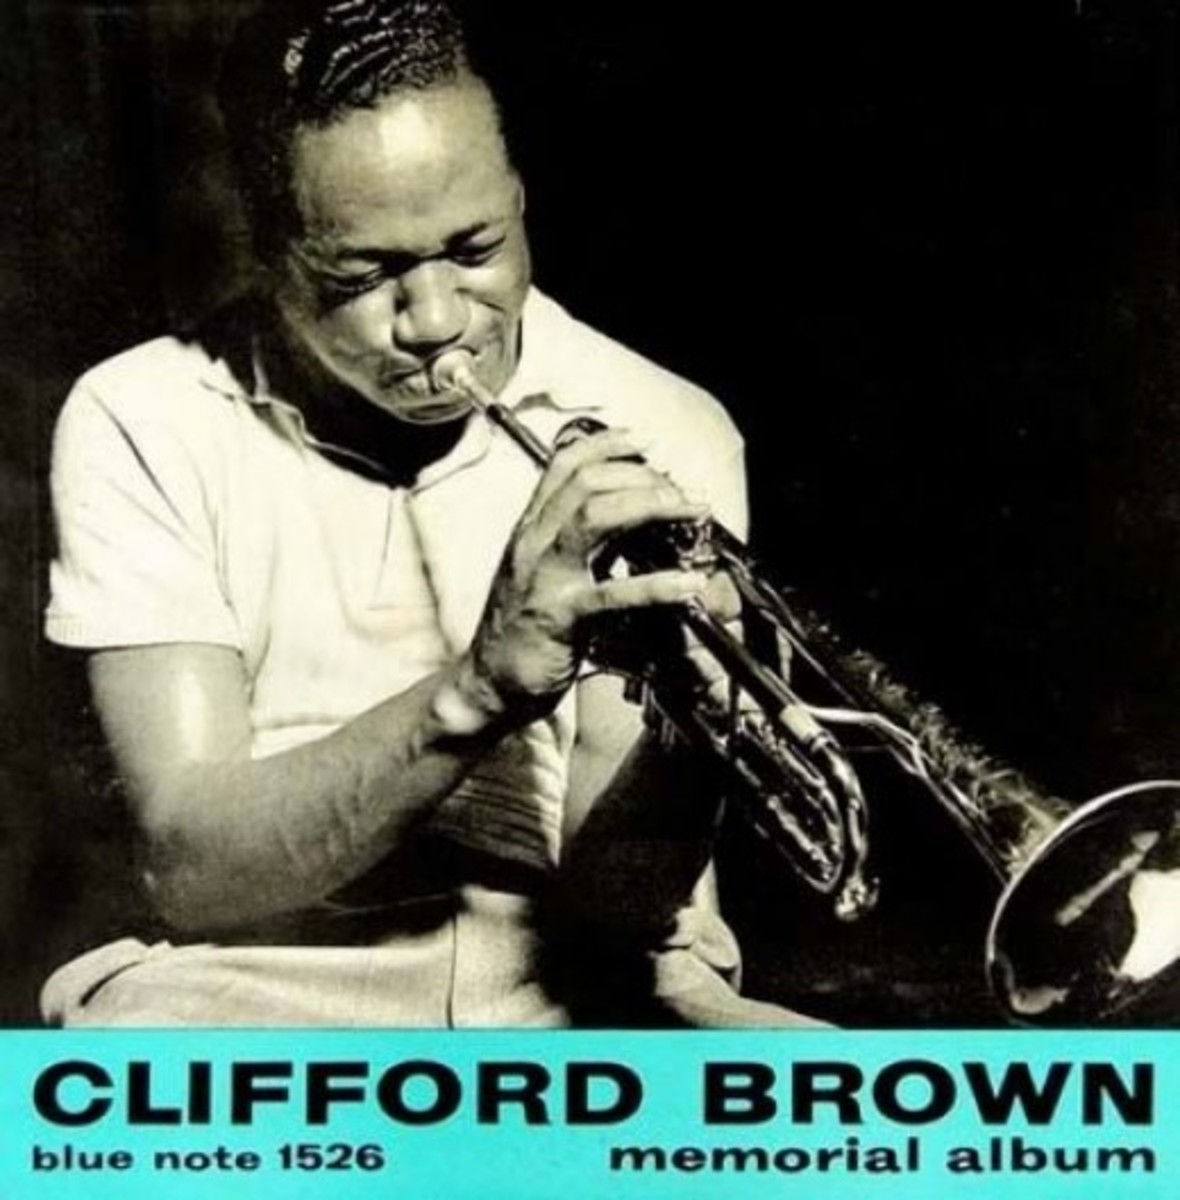 "Clifford Brown ""Memorial Album"" Blue Note Records BLP 1526 LP Vinyl Record (1956) Album Cover Design Reid Miles Photo by Francis Wolff"